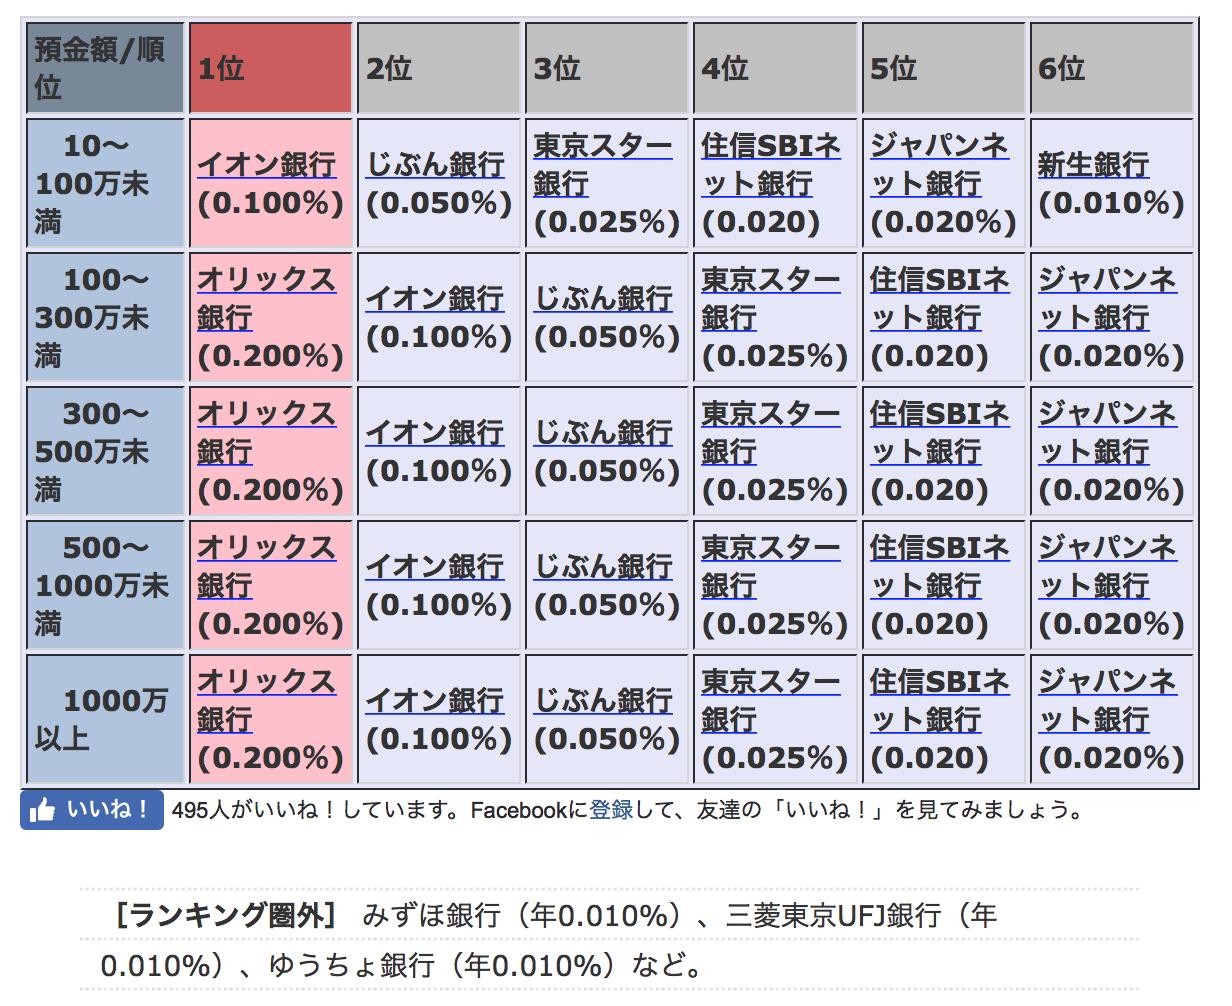 %e3%82%b9%e3%82%af%e3%83%aa%e3%83%bc%e3%83%b3%e3%82%b7%e3%83%a7%e3%83%83%e3%83%88-2016-10-22-16-49-42